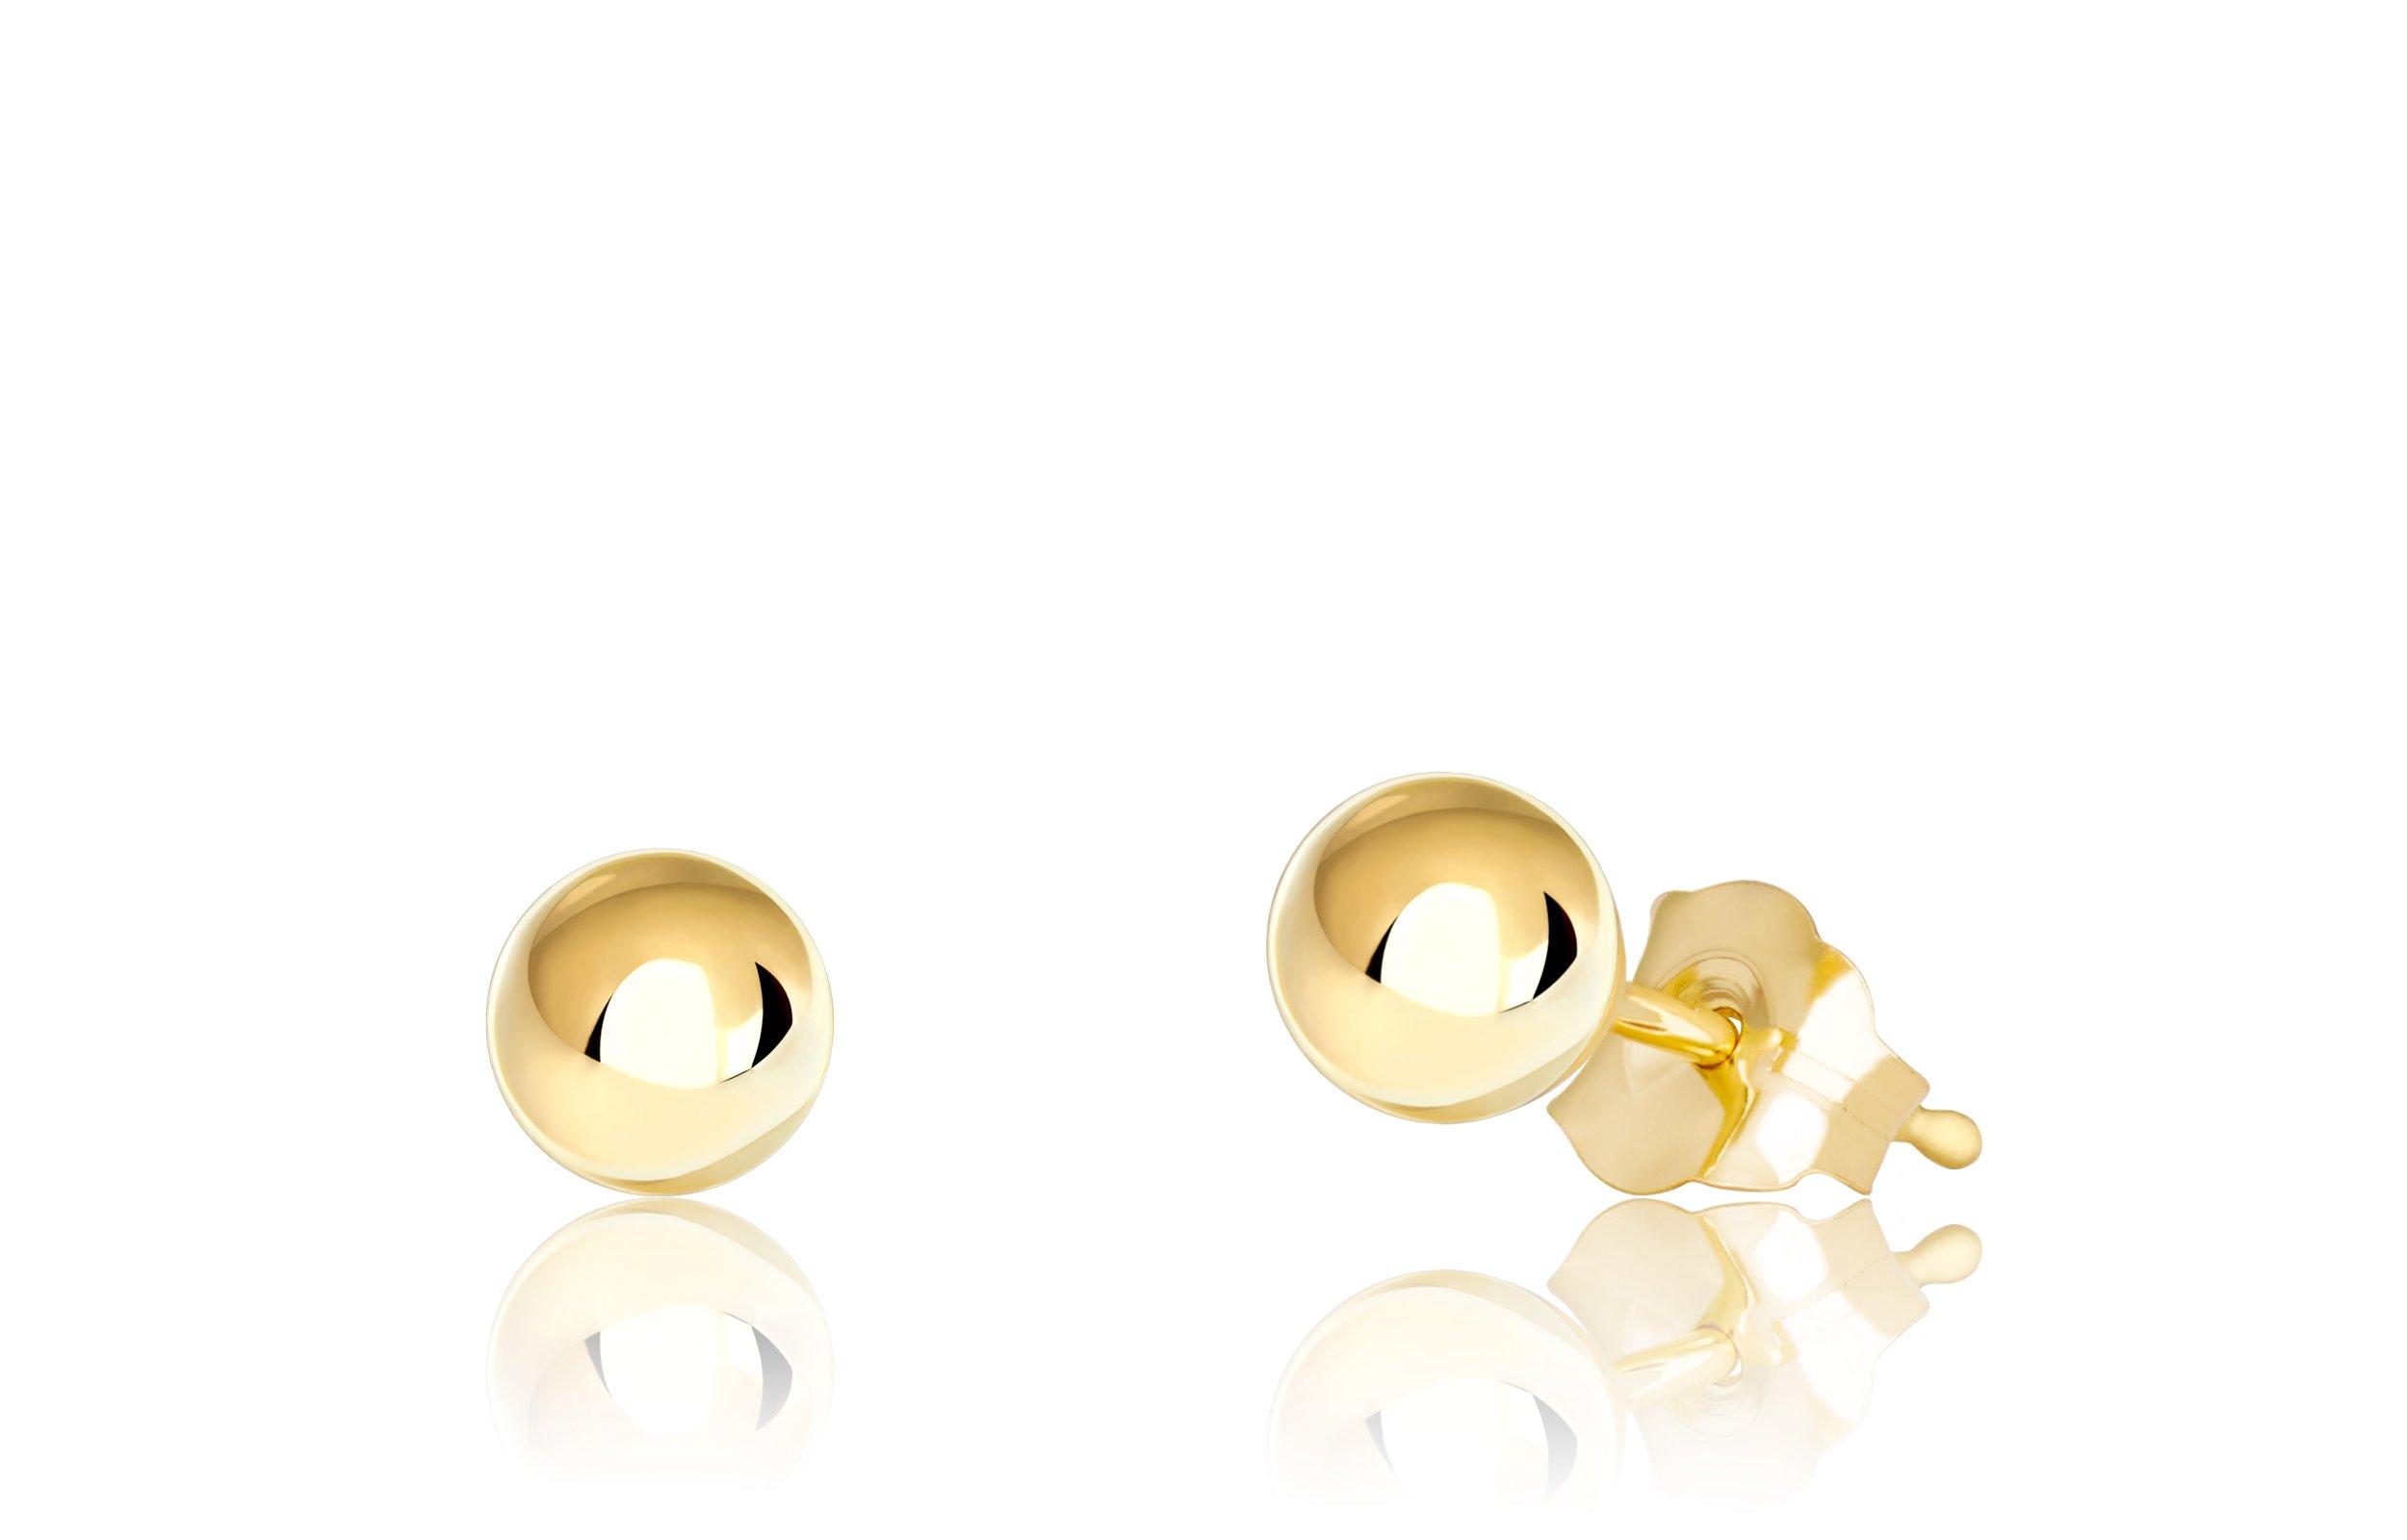 Premium 14K Yellow Gold Ball Stud Earrings (4mm - Yellow Gold)